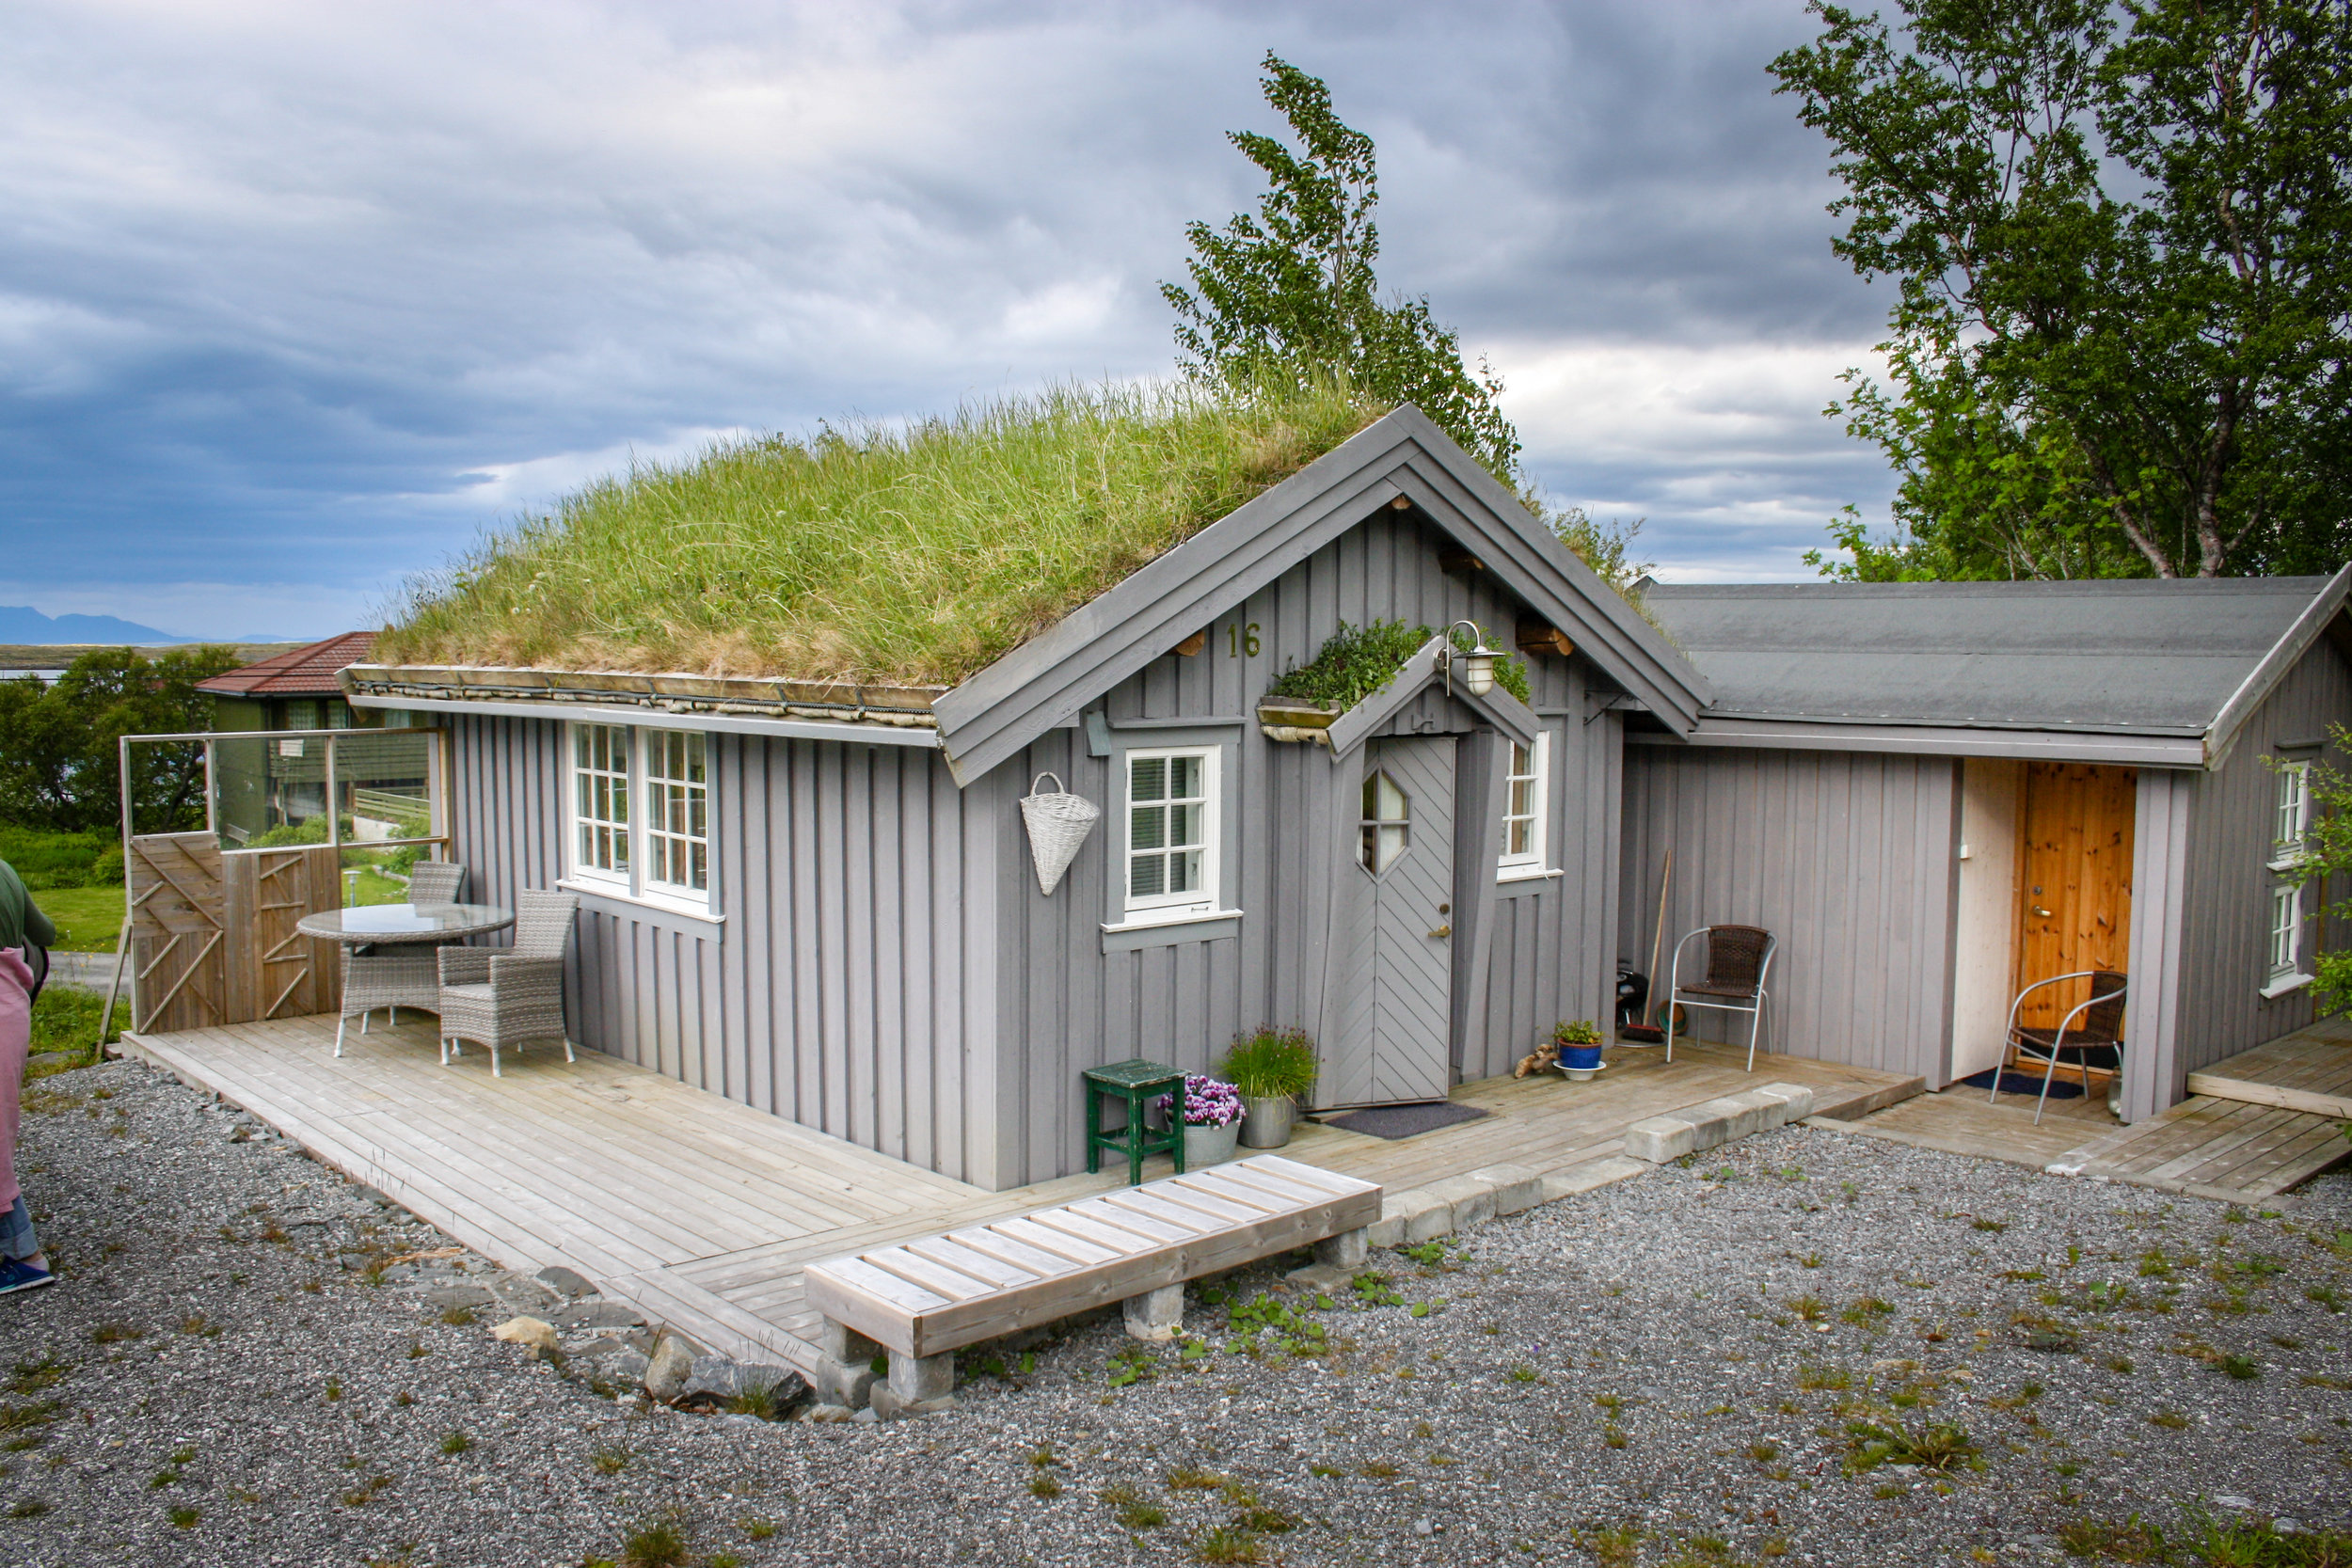 Hytte med anneks - Nes/Holand